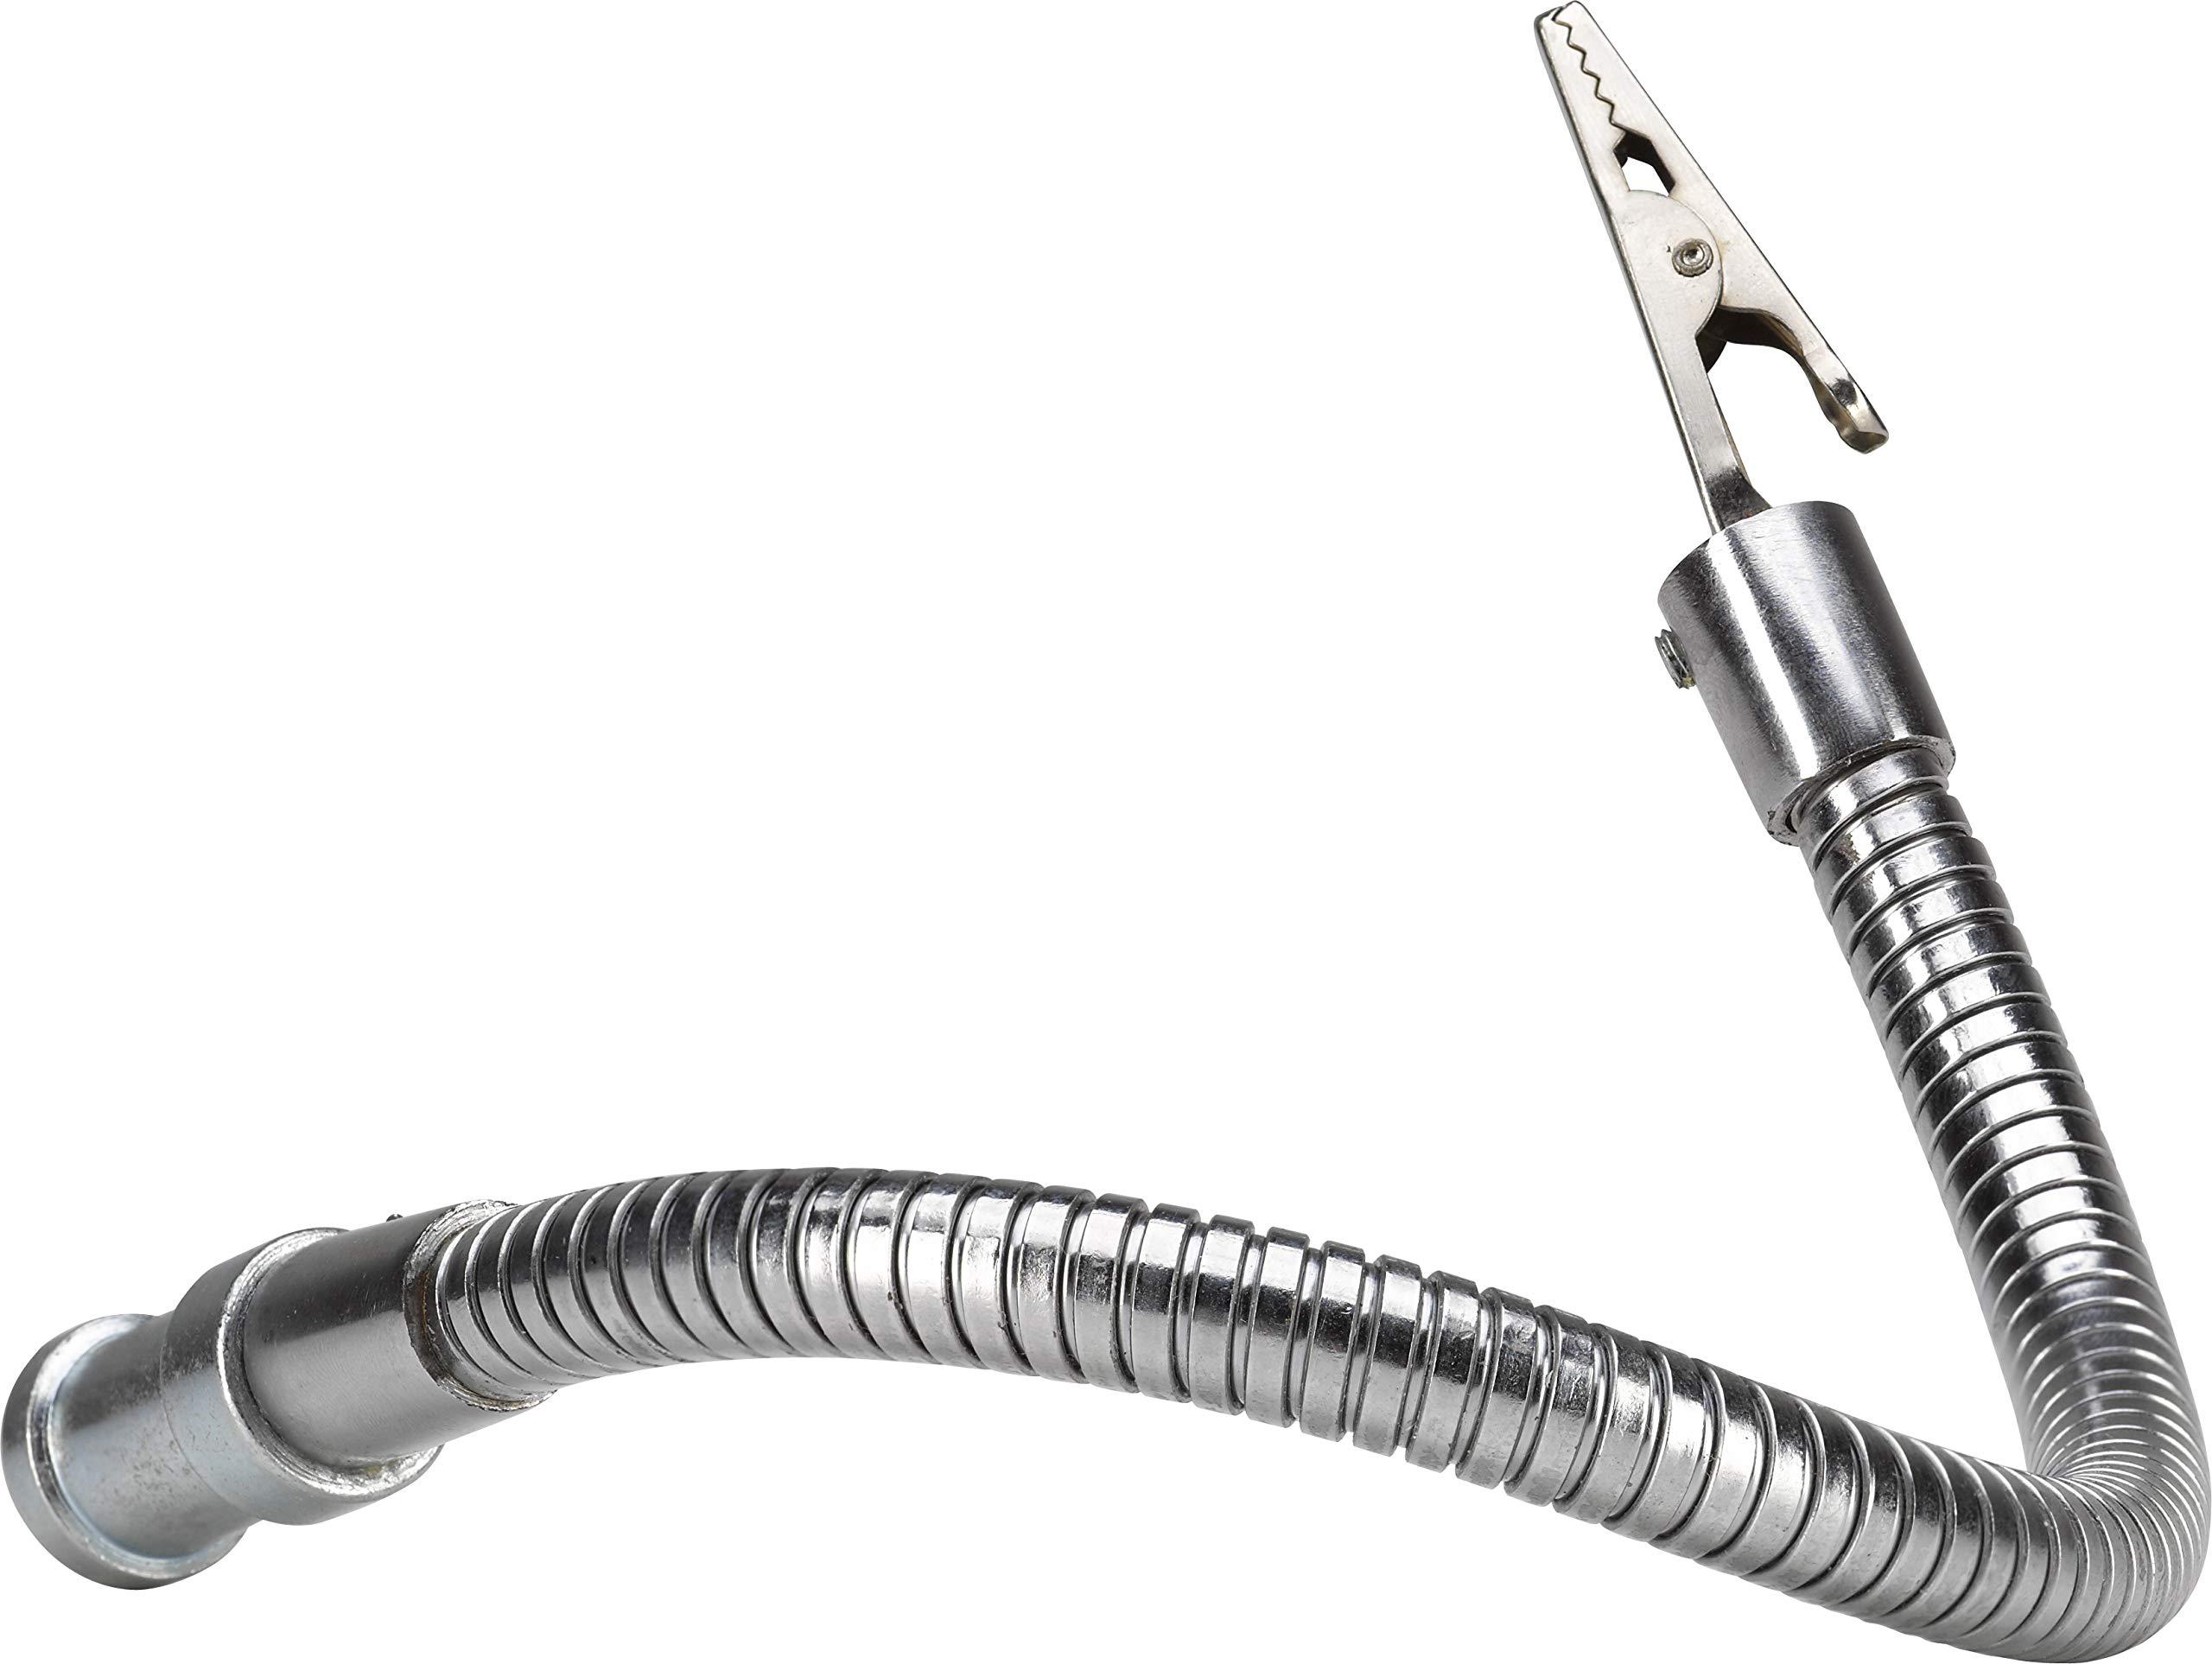 Kupo Mini Flex Arm with Alligator Clip (KD700912)